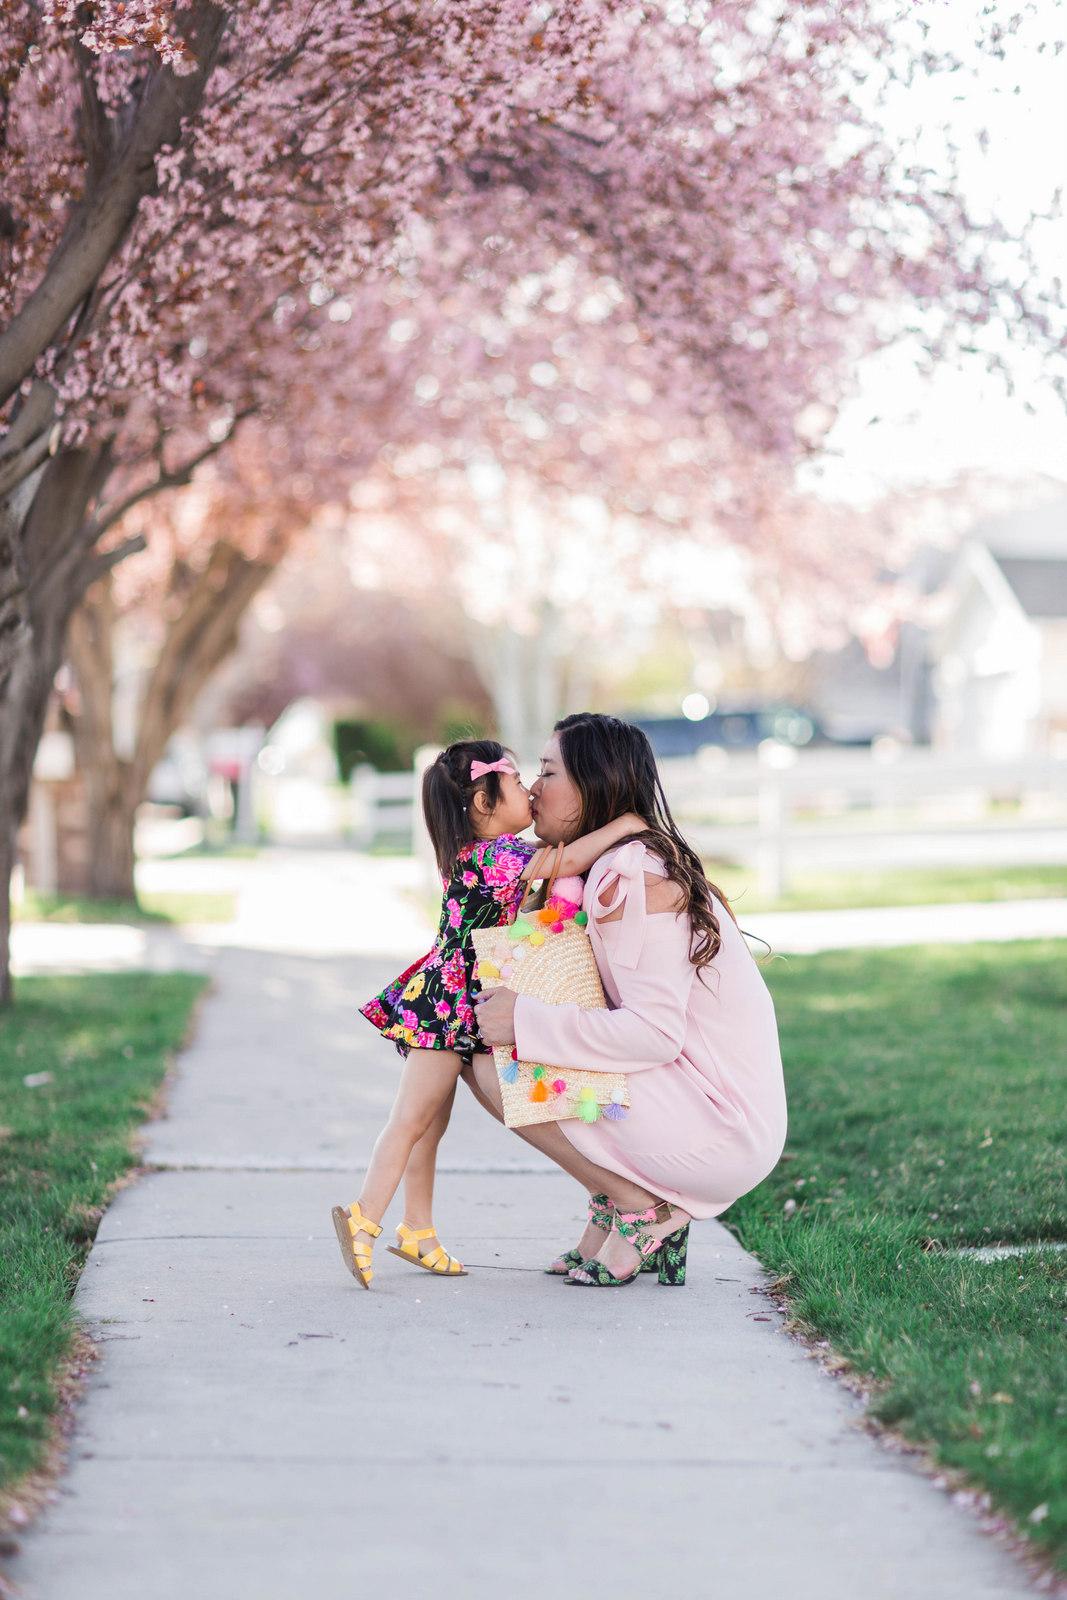 Little Minis floral dress